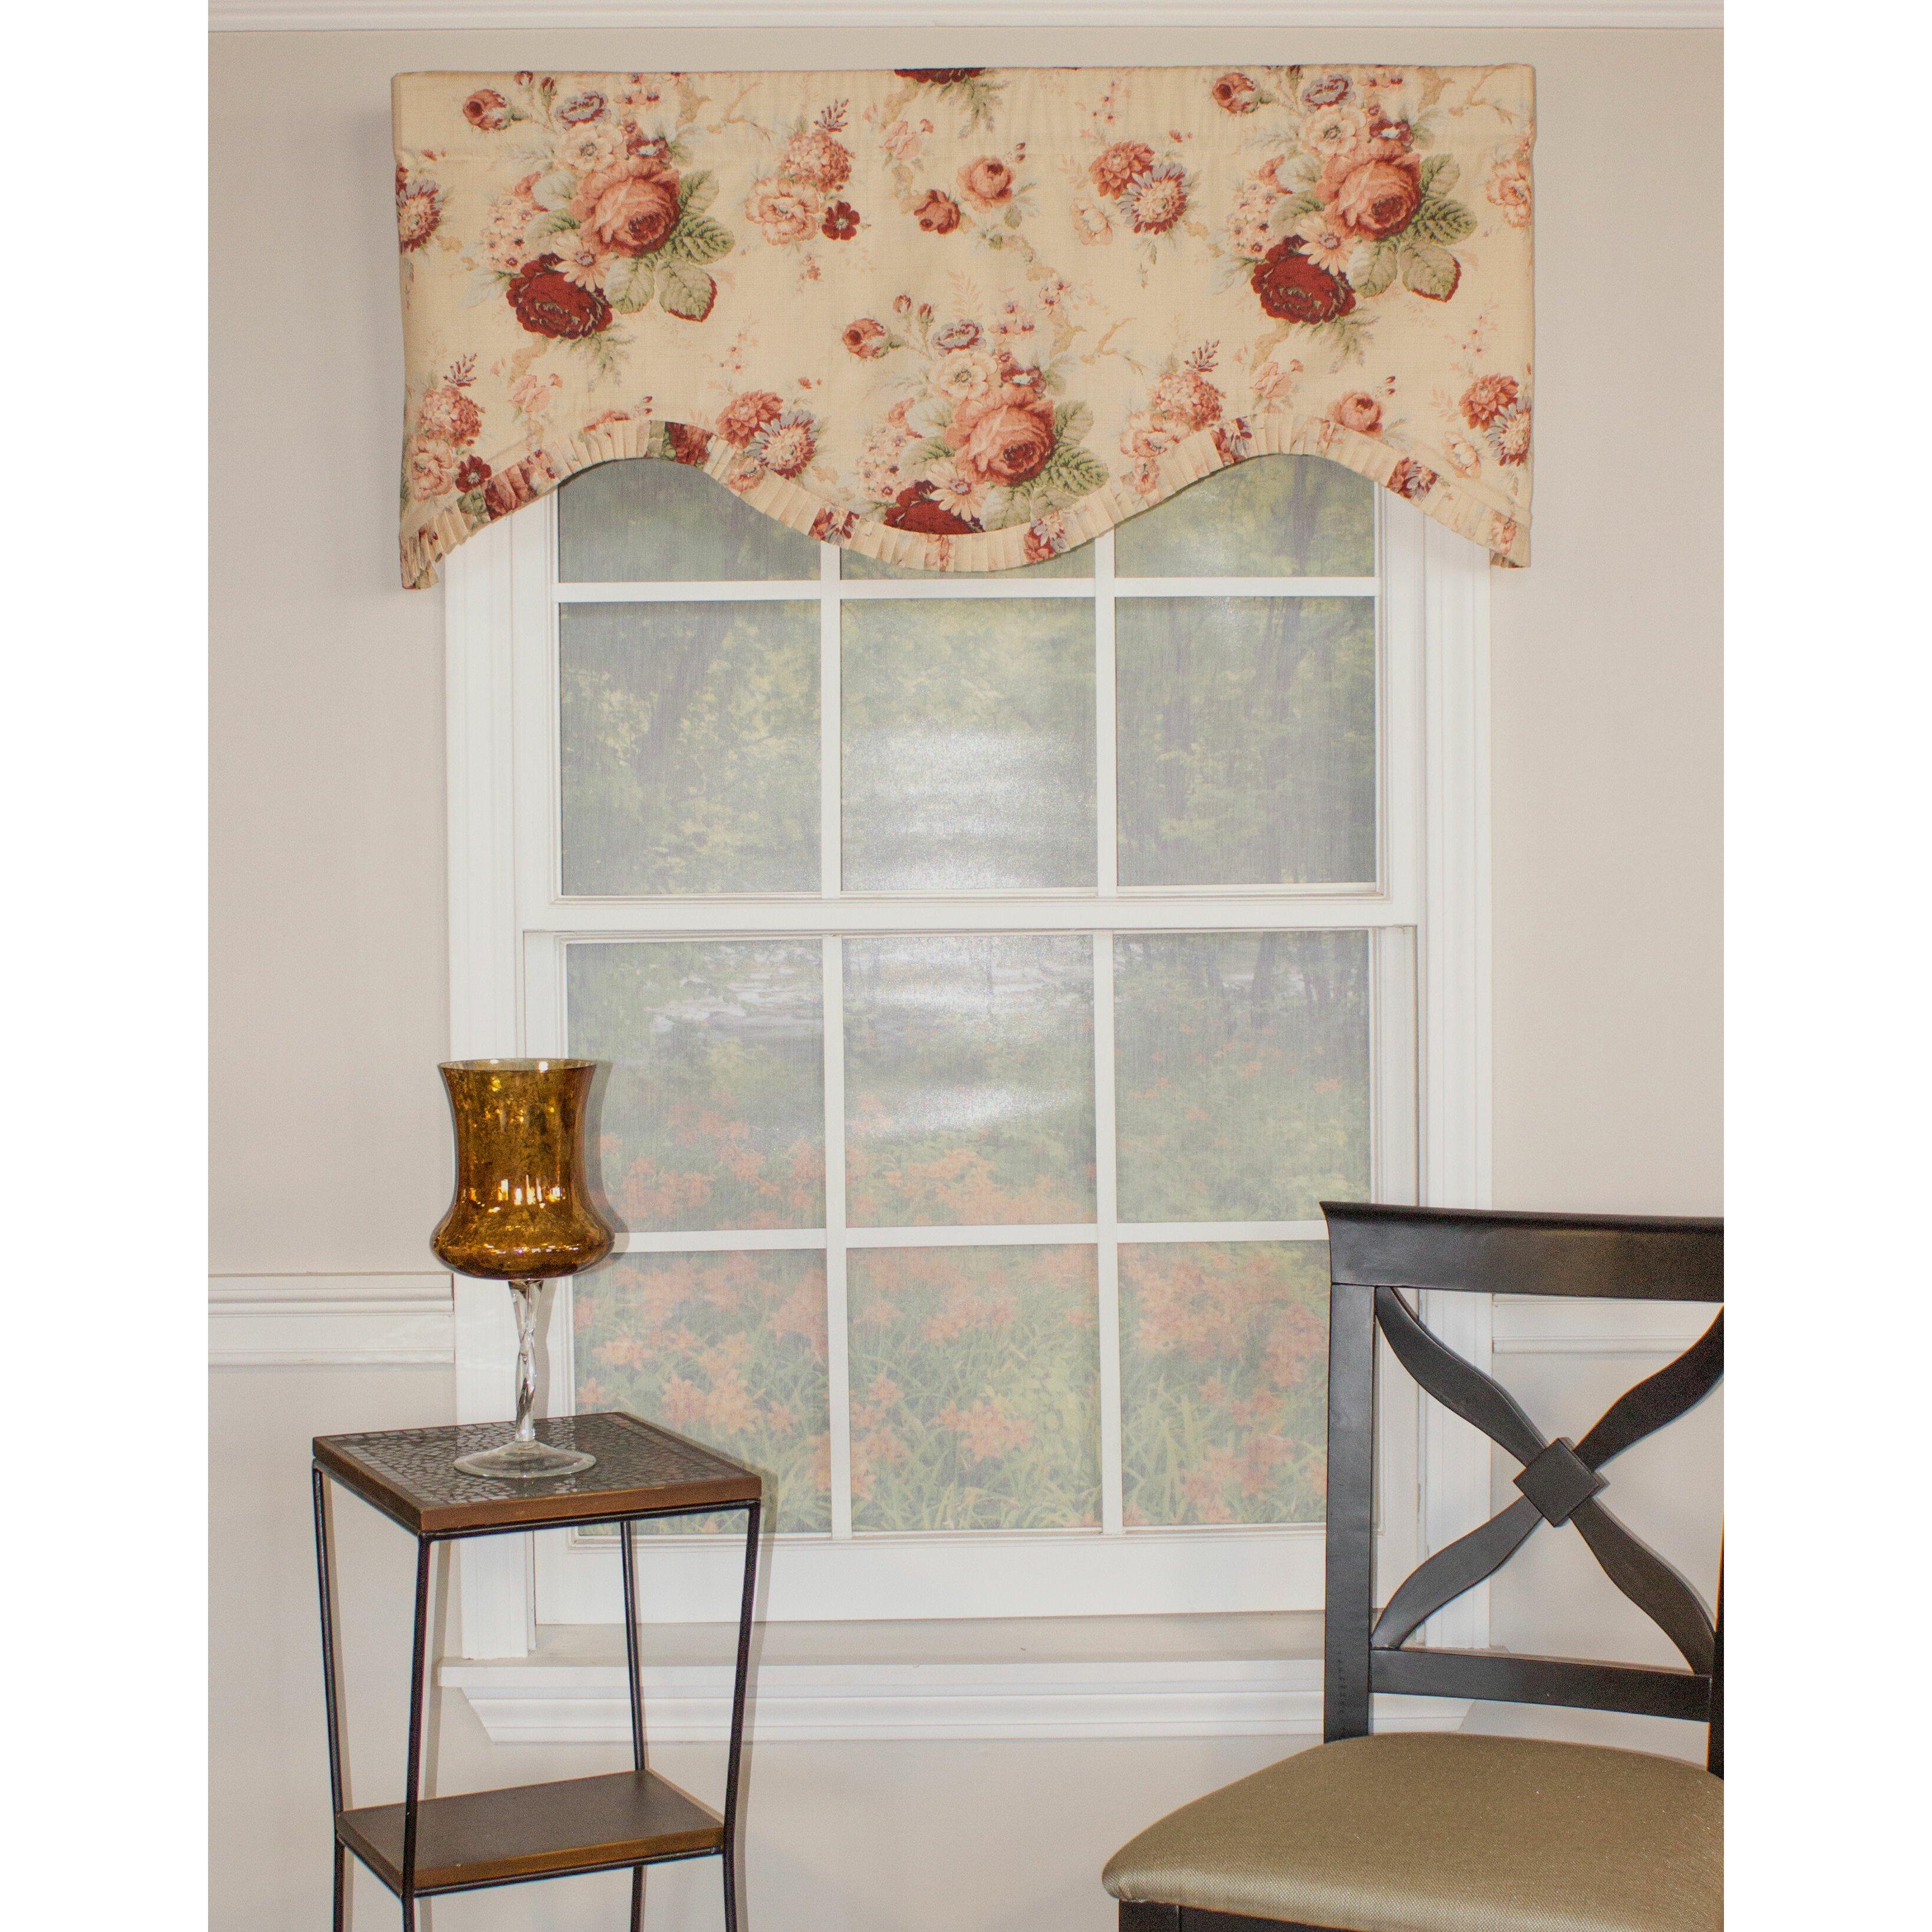 Rlf Home English Rose Cornice 50 Curtain Valance